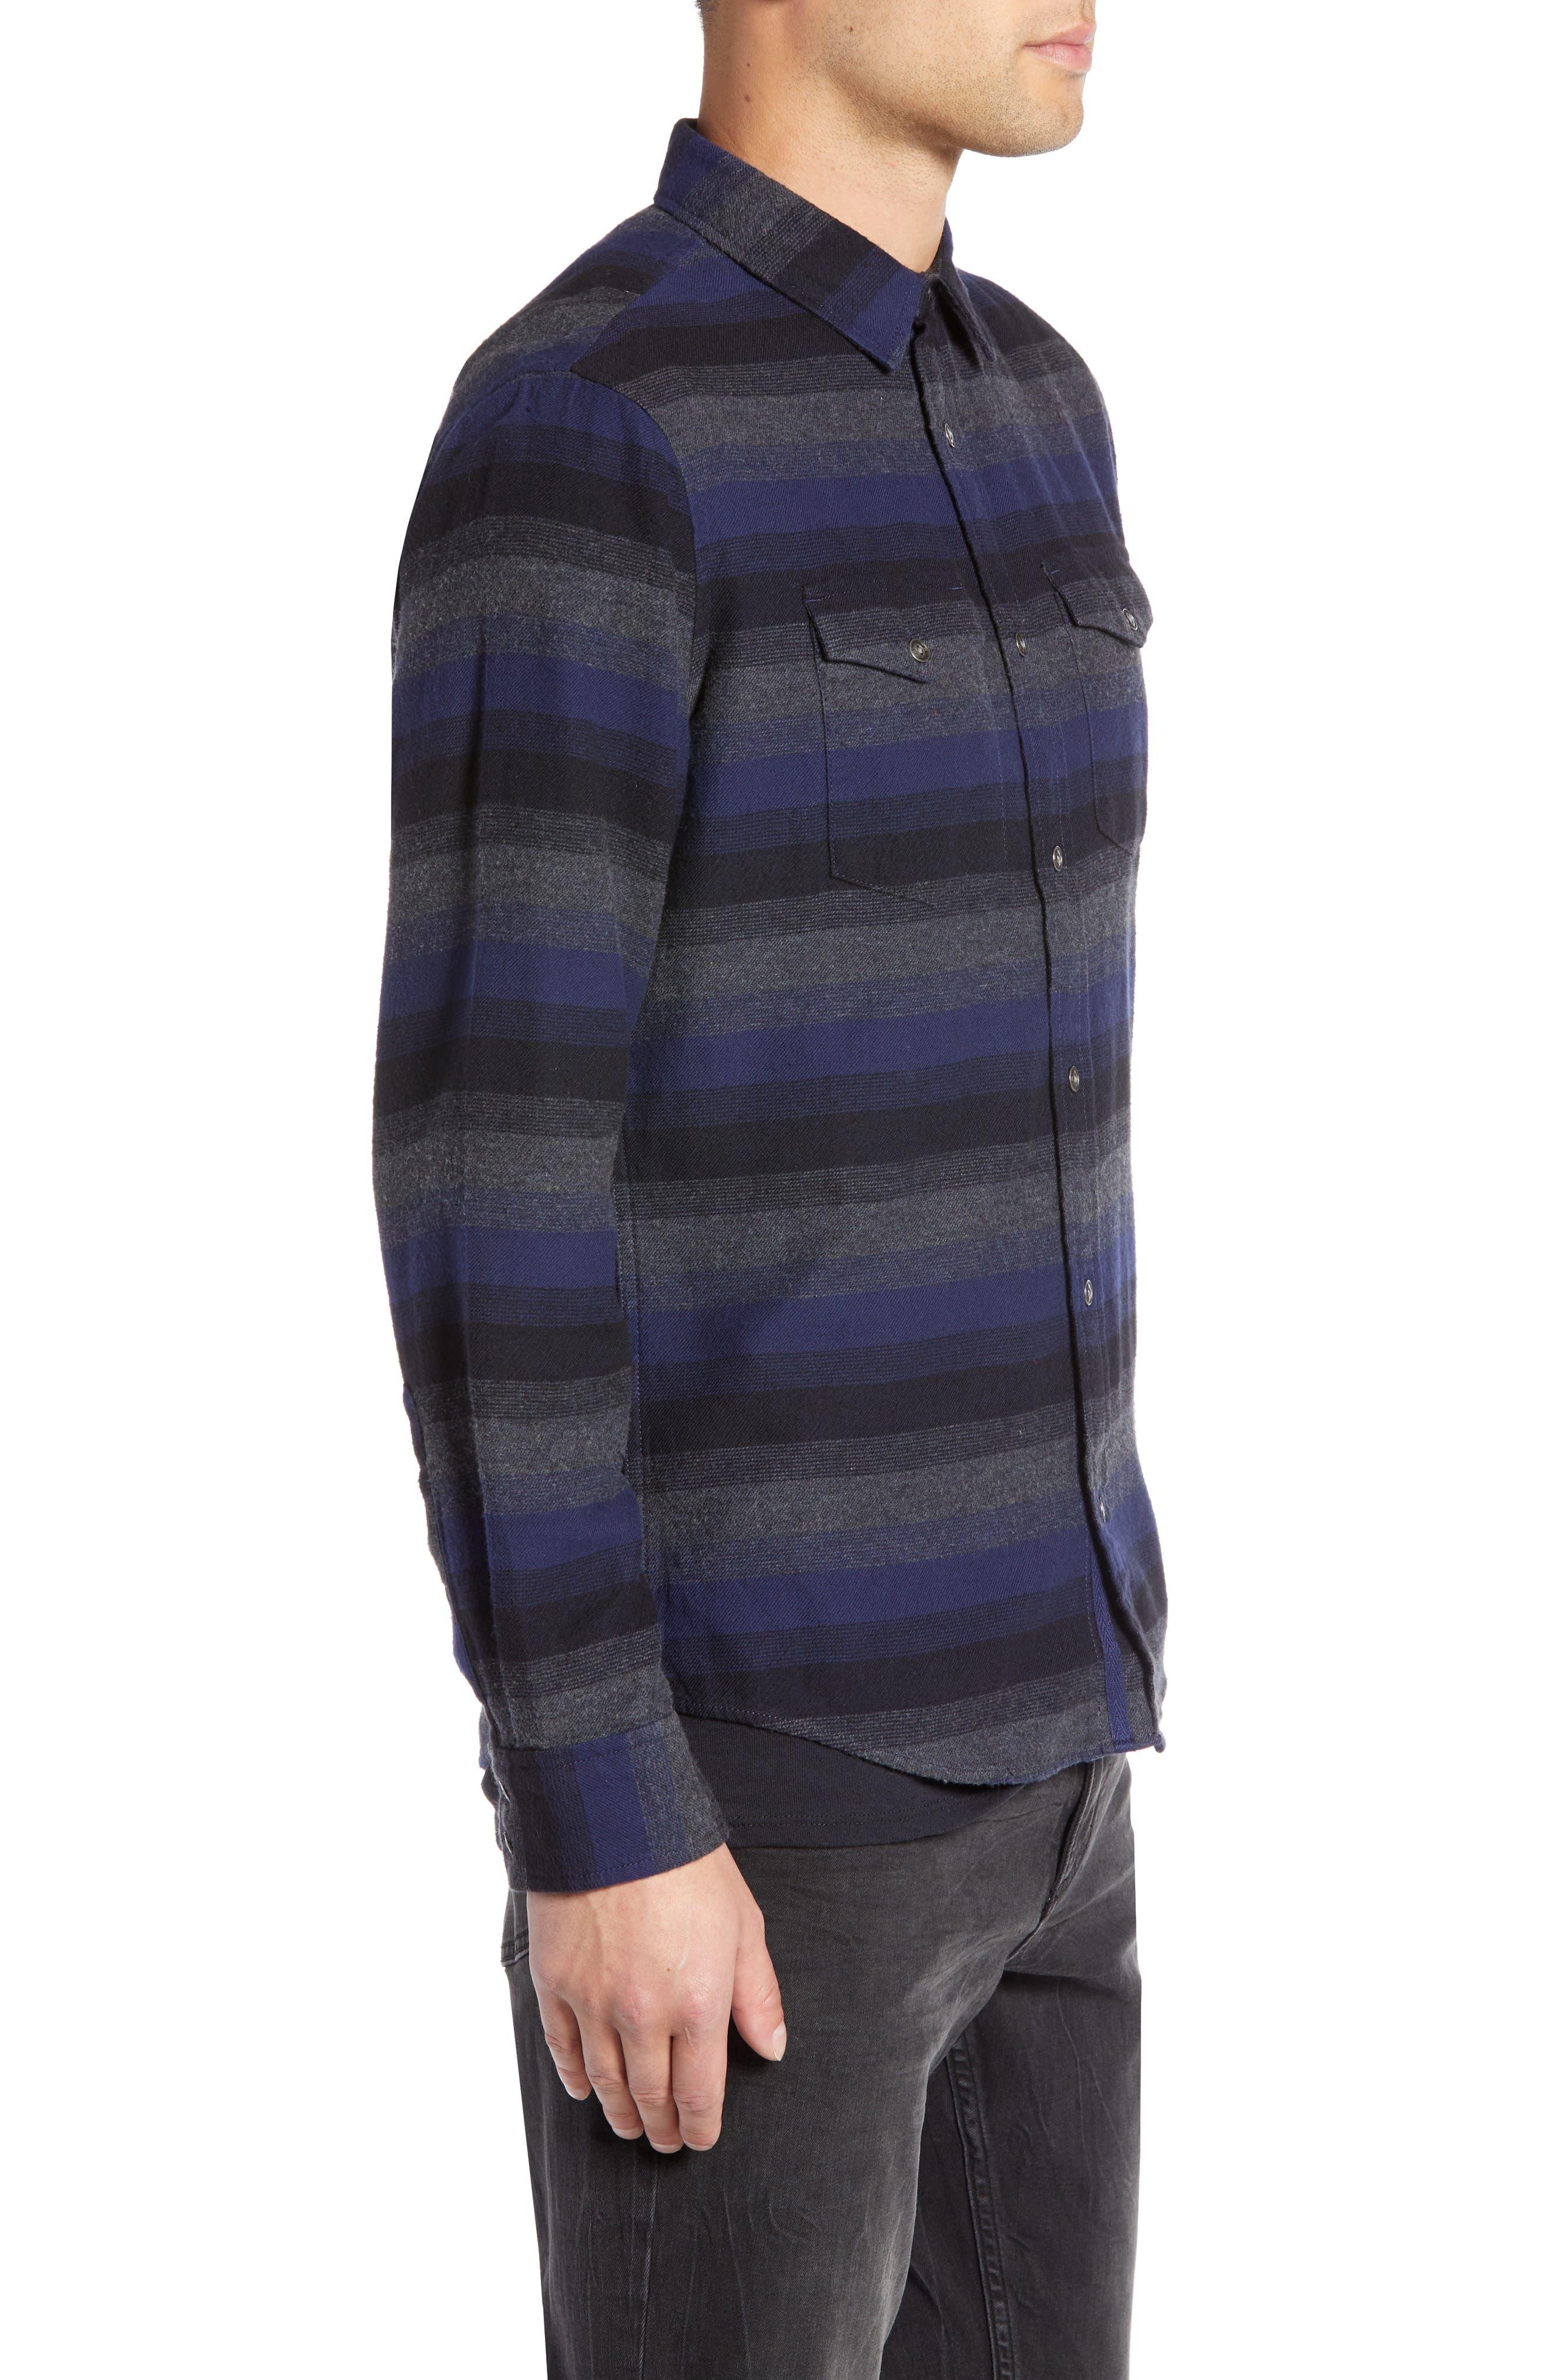 Regular Fit Ombré Sport Shirt,                             Alternate thumbnail 4, color,                             NAVY CHARCOAL OMBRE STRIPE